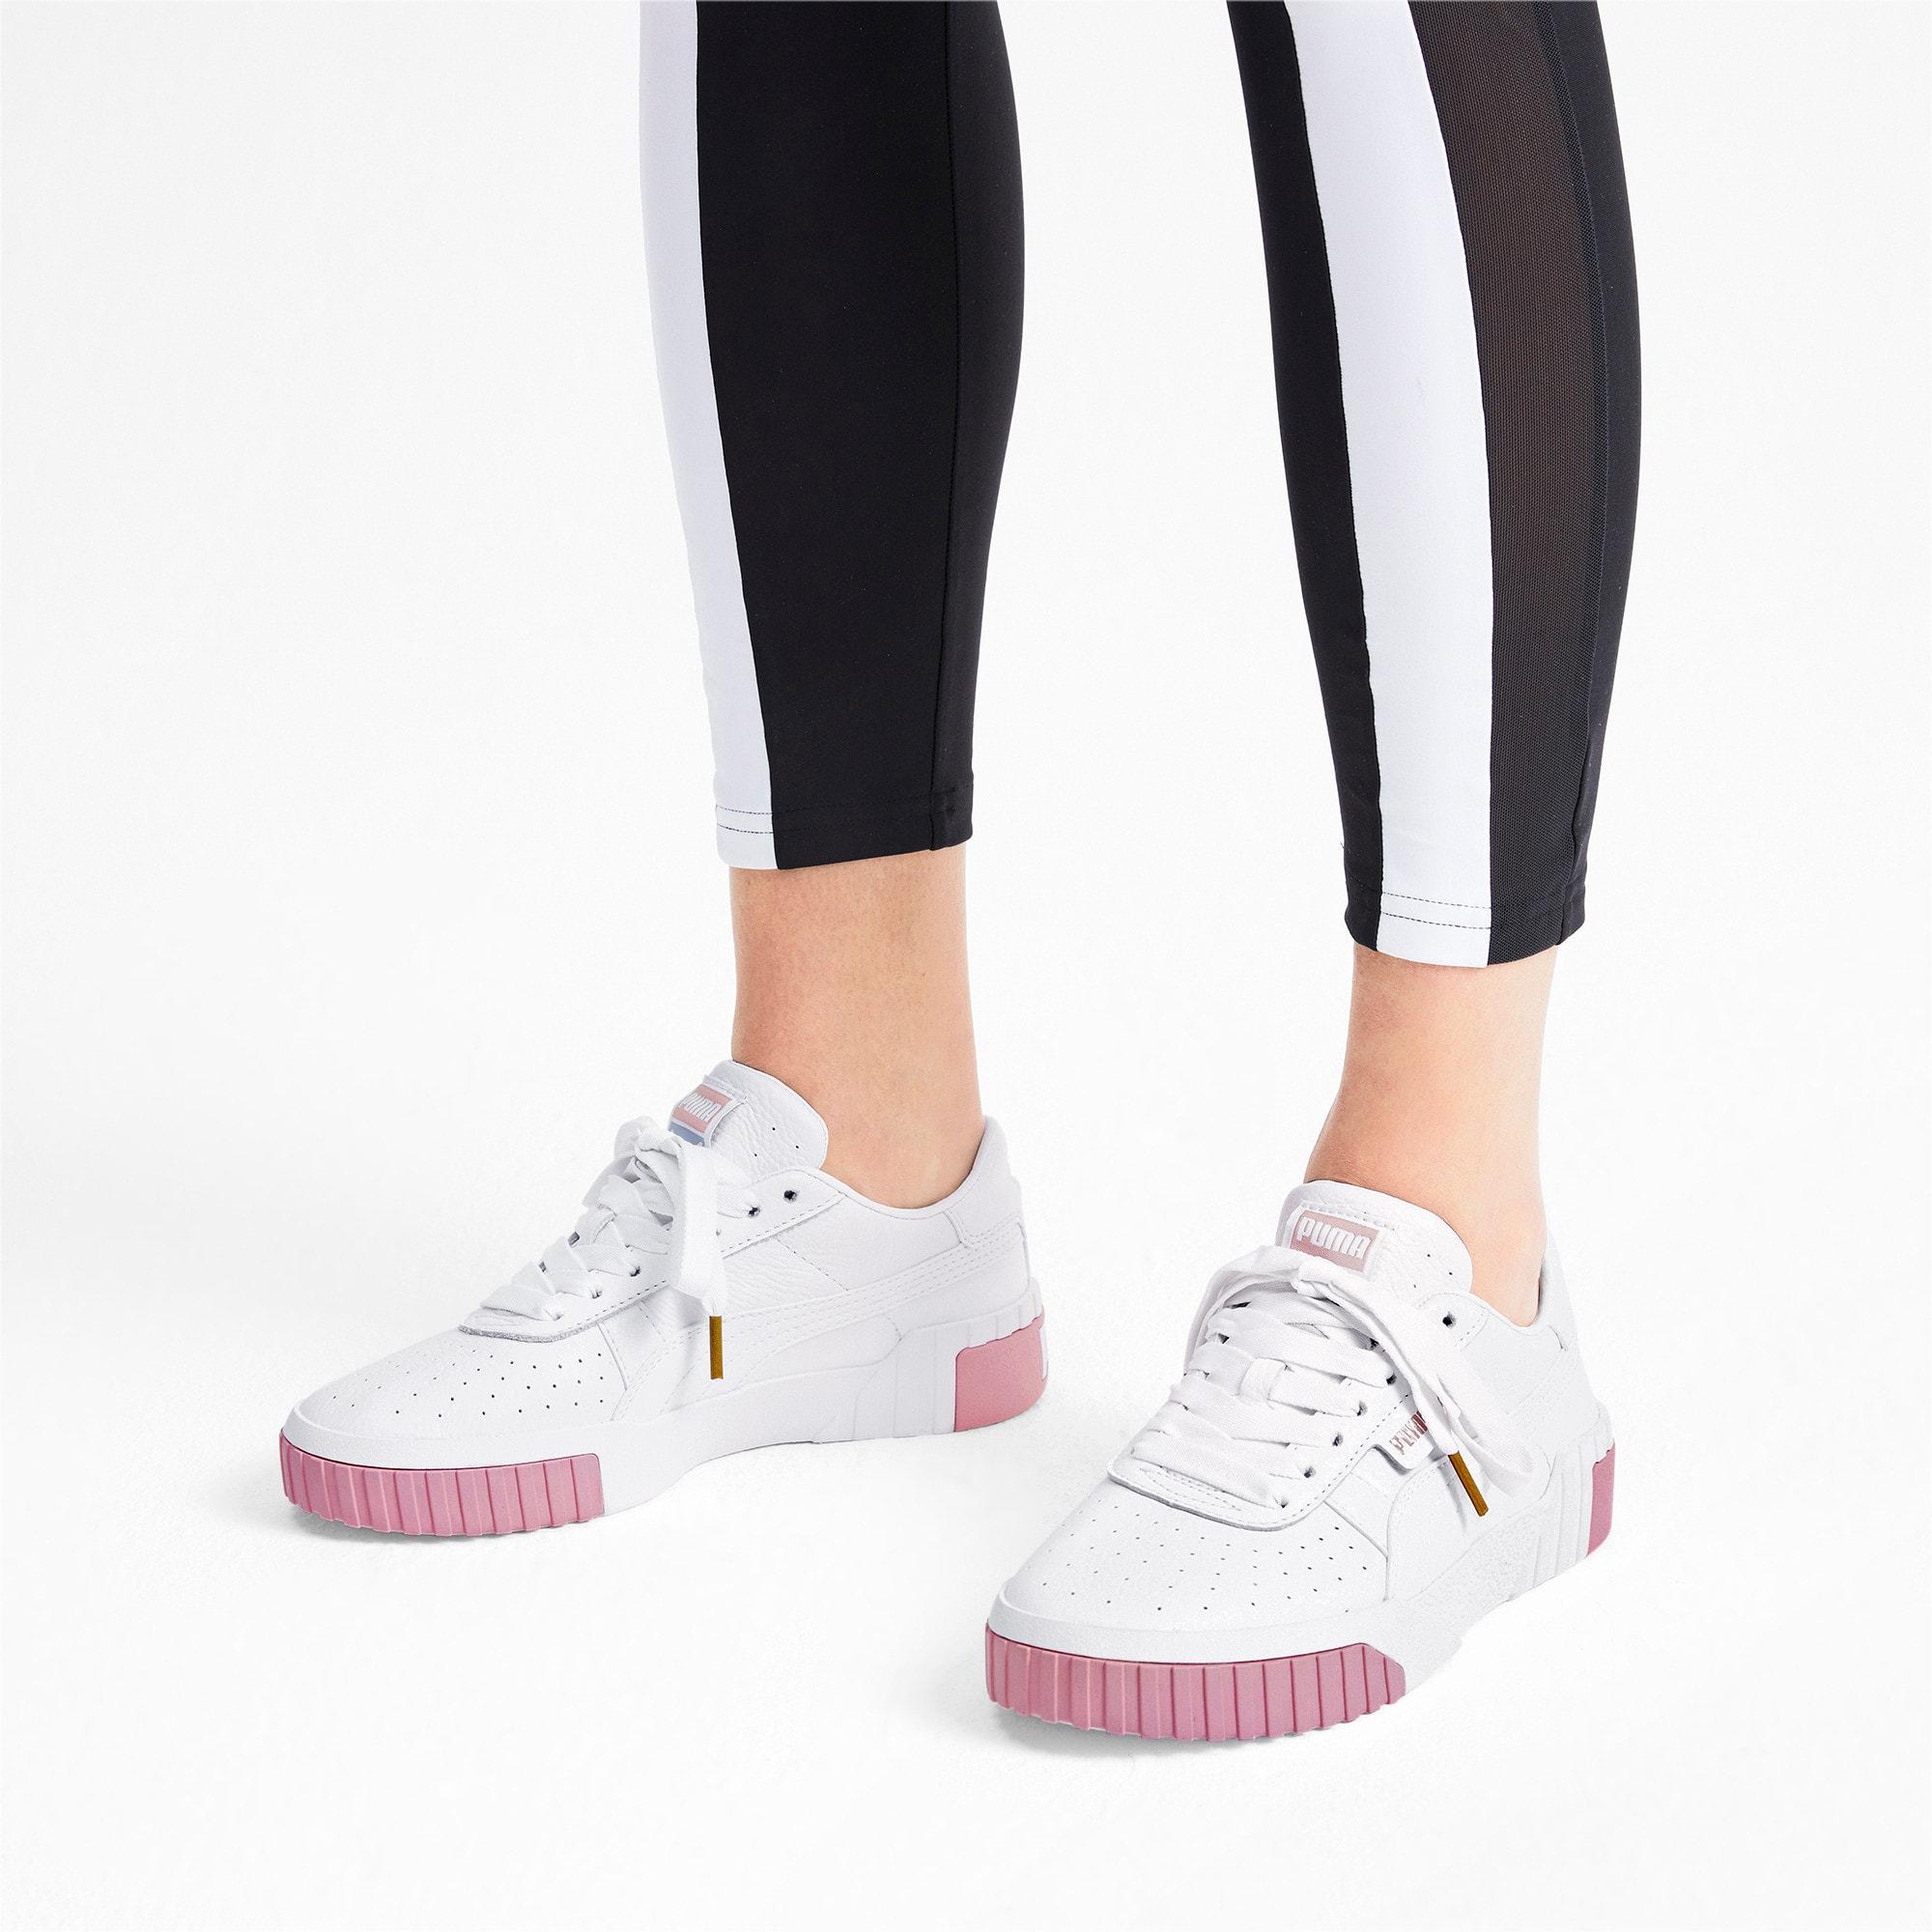 Thumbnail 2 of Cali Women's Sneakers, Puma White-Rose Gold, medium